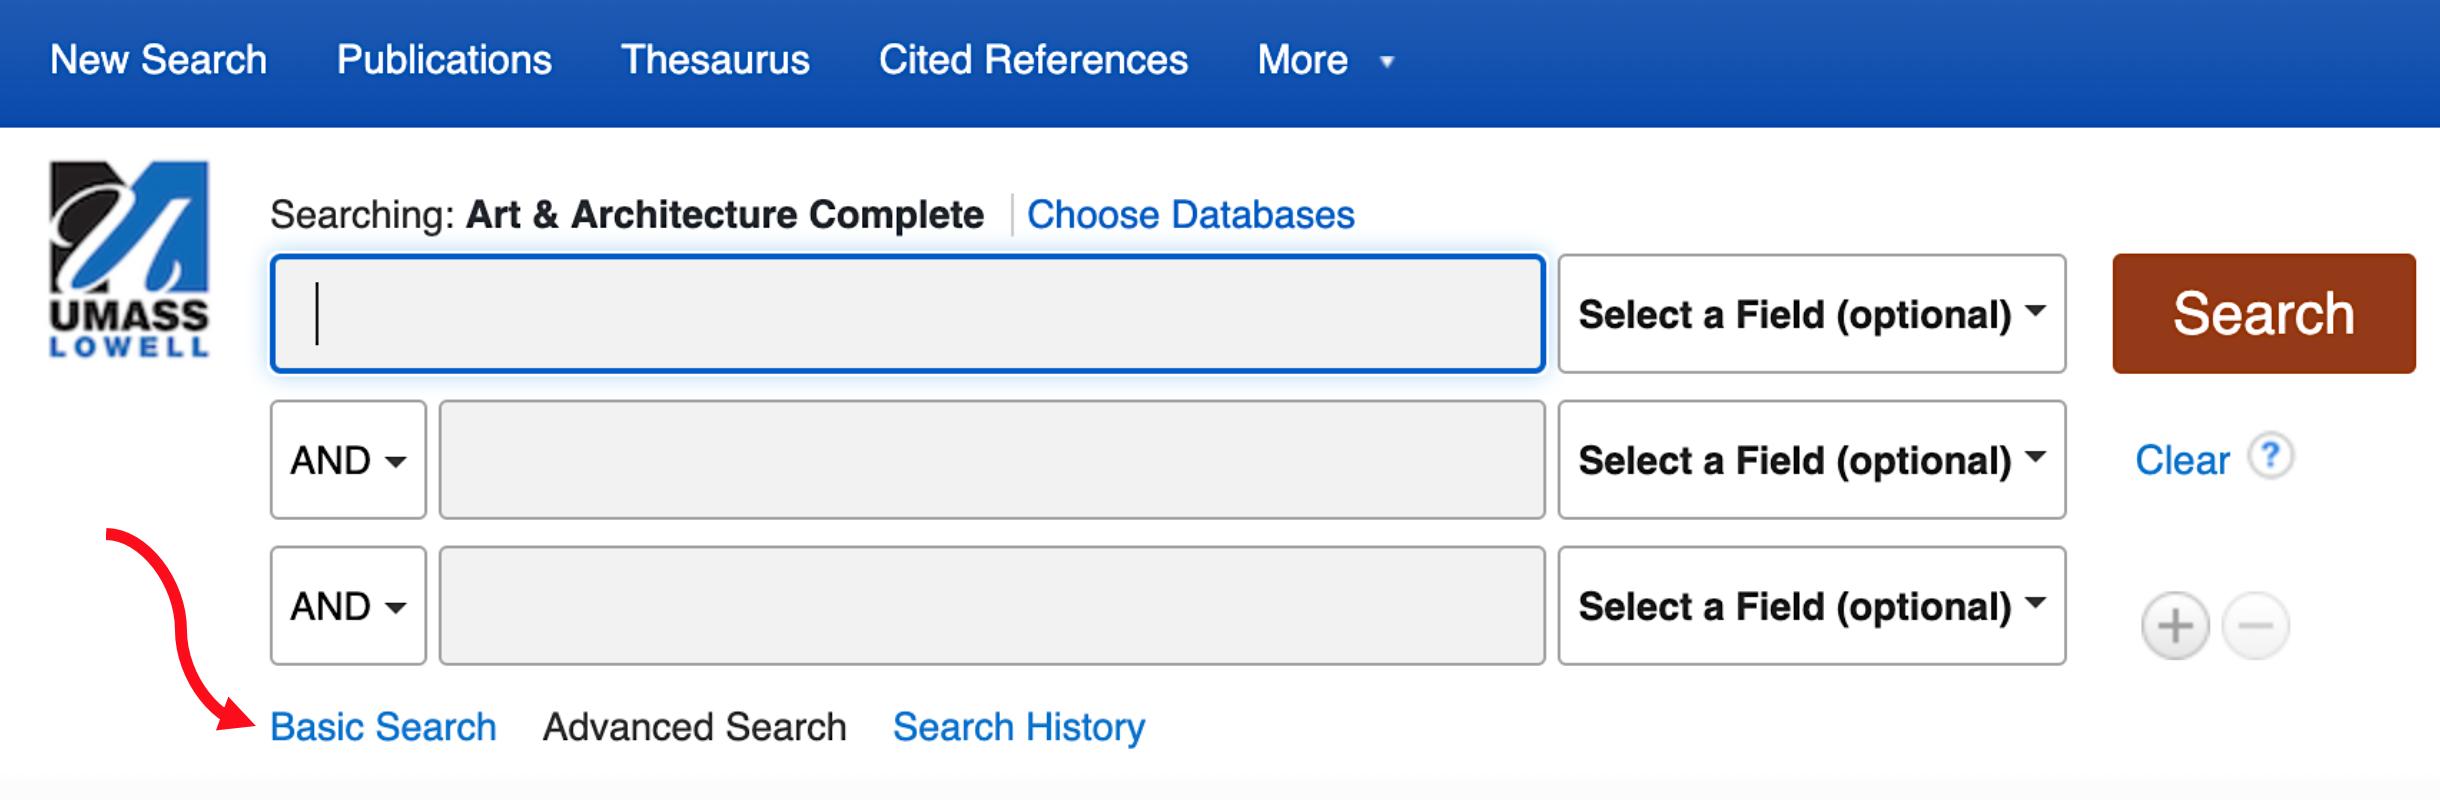 basic search tab dialog box